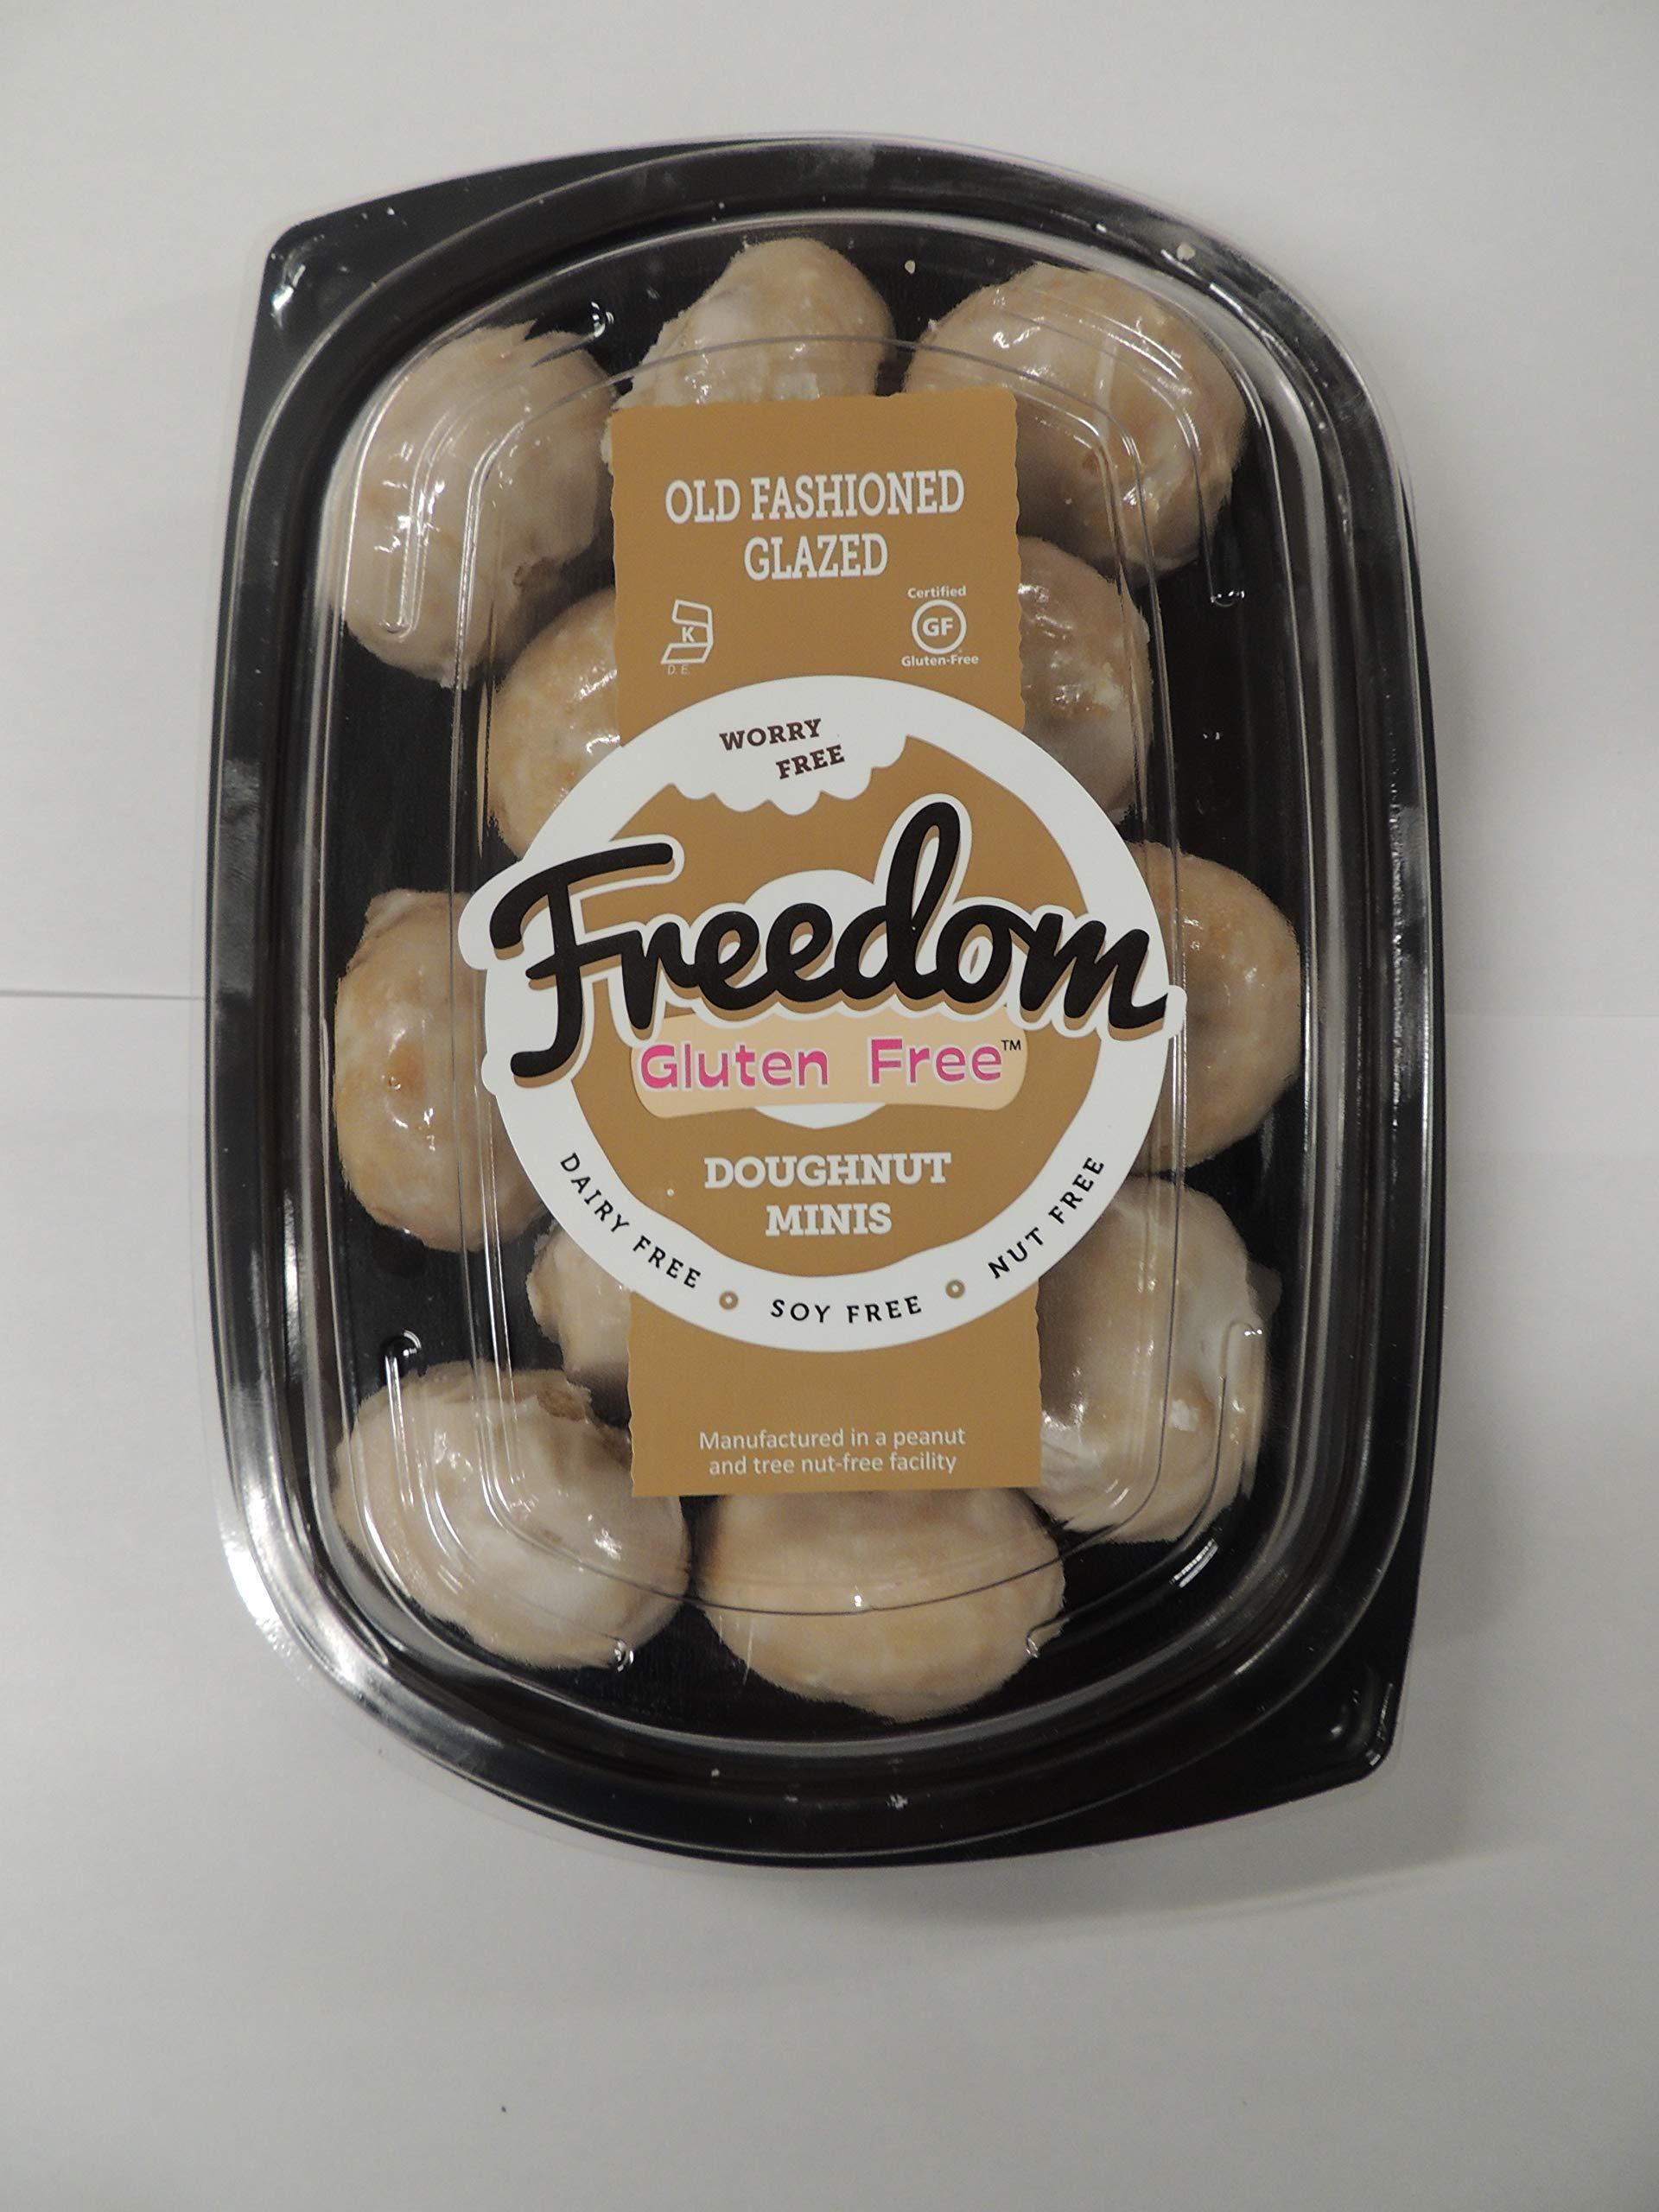 Freedom Bakery Gluten Free Doughnut Minis (Doughnut Holes) by Freedom Gluten Free